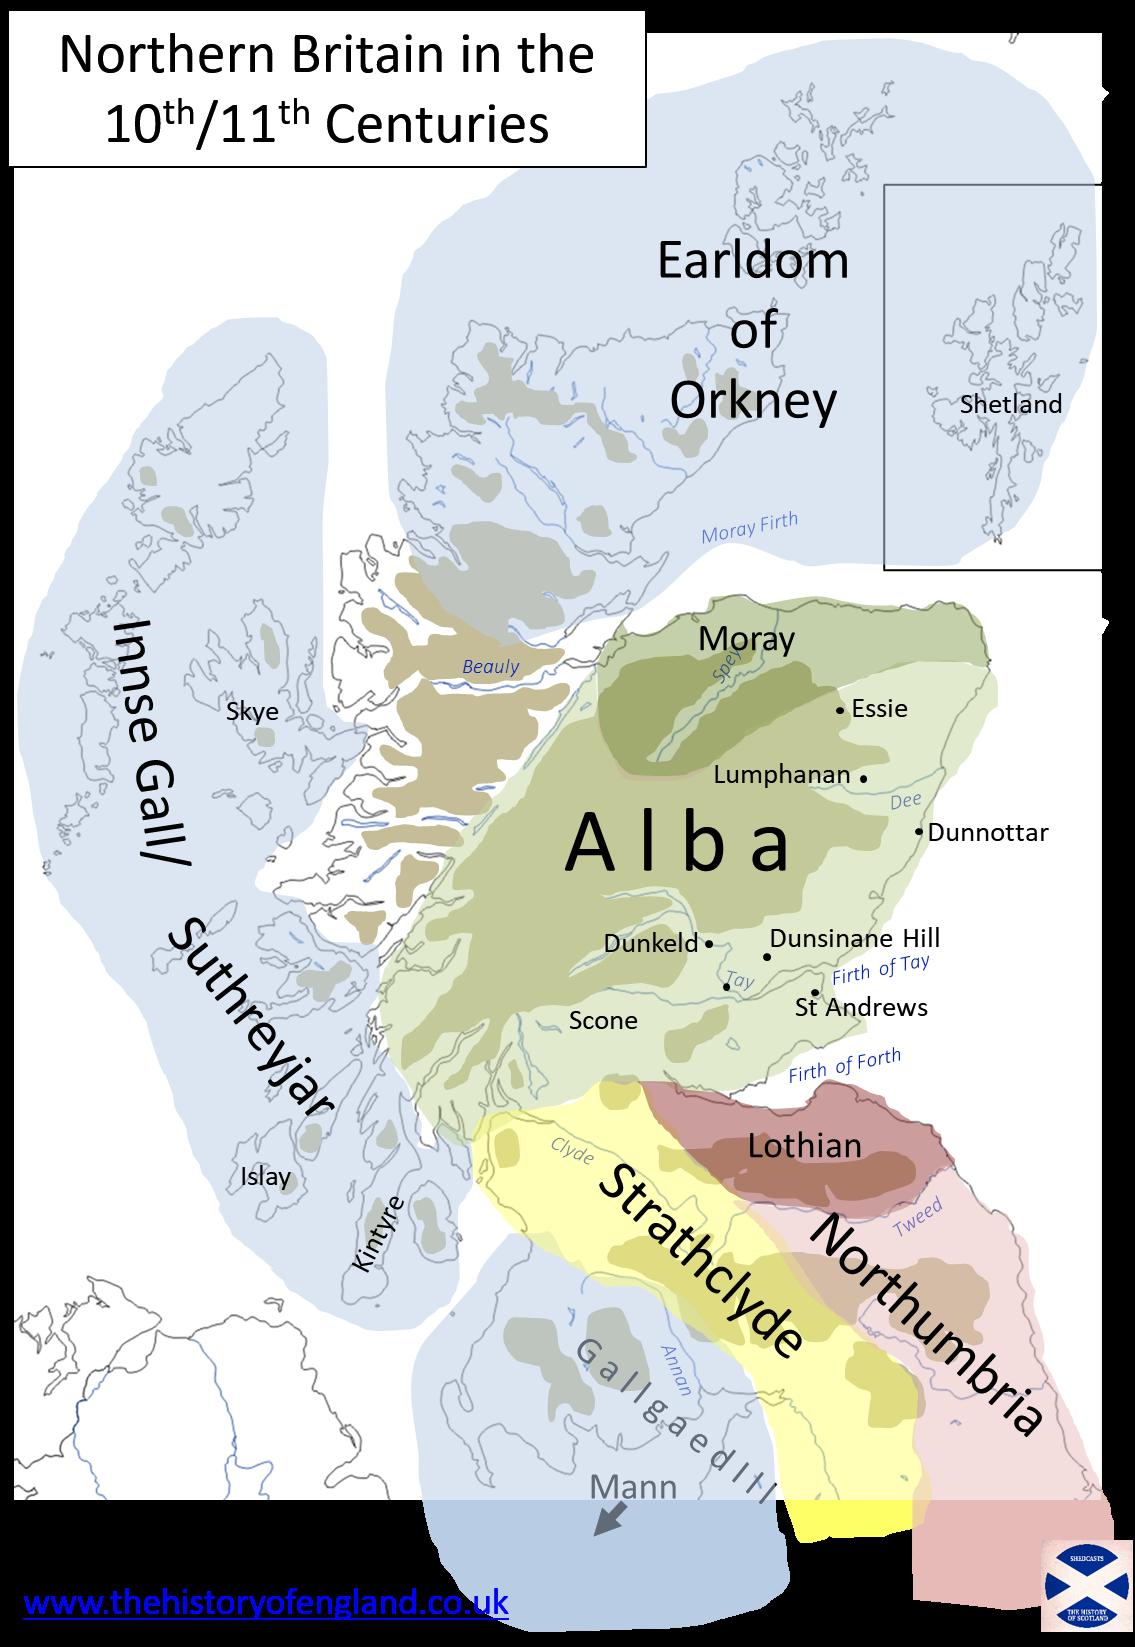 Scotland 10-11th Centuries